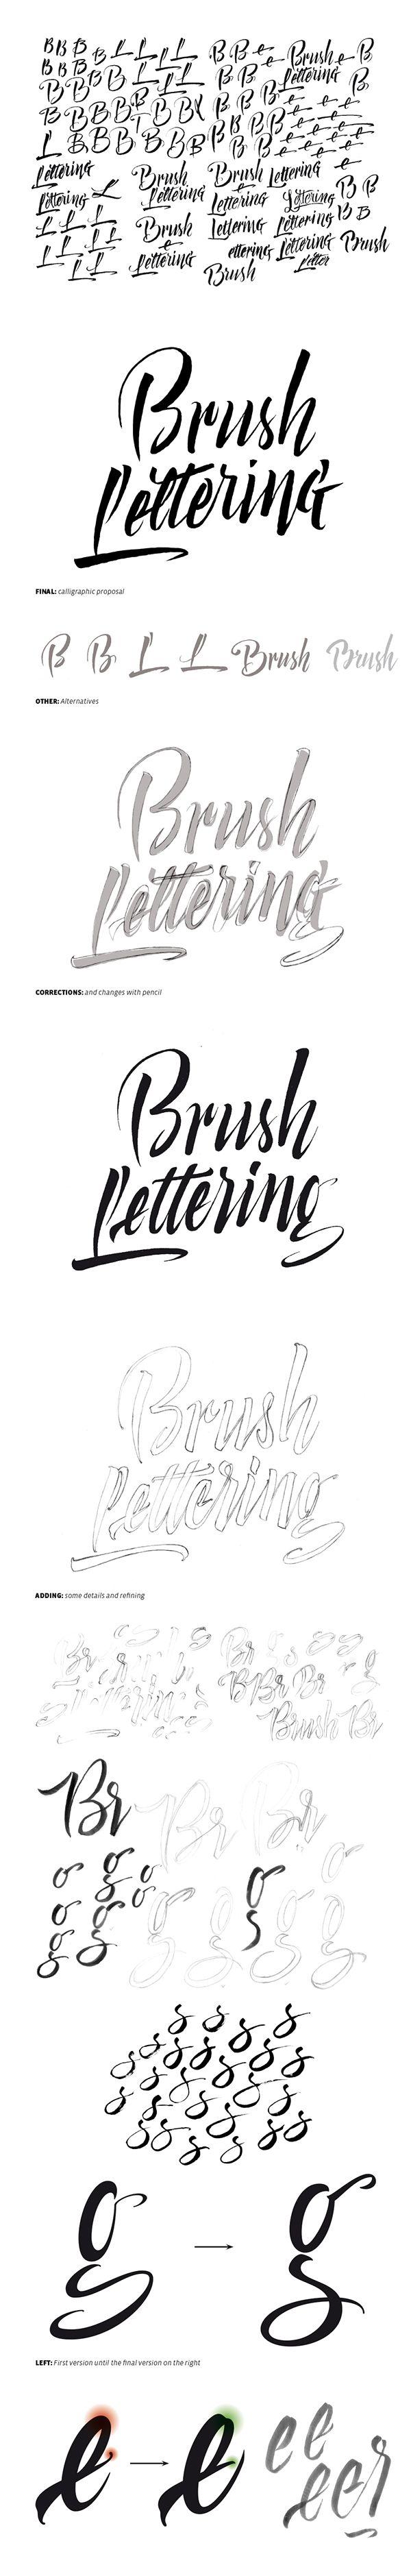 Brush Lettering by Bogidar Mascareñas, via Behance